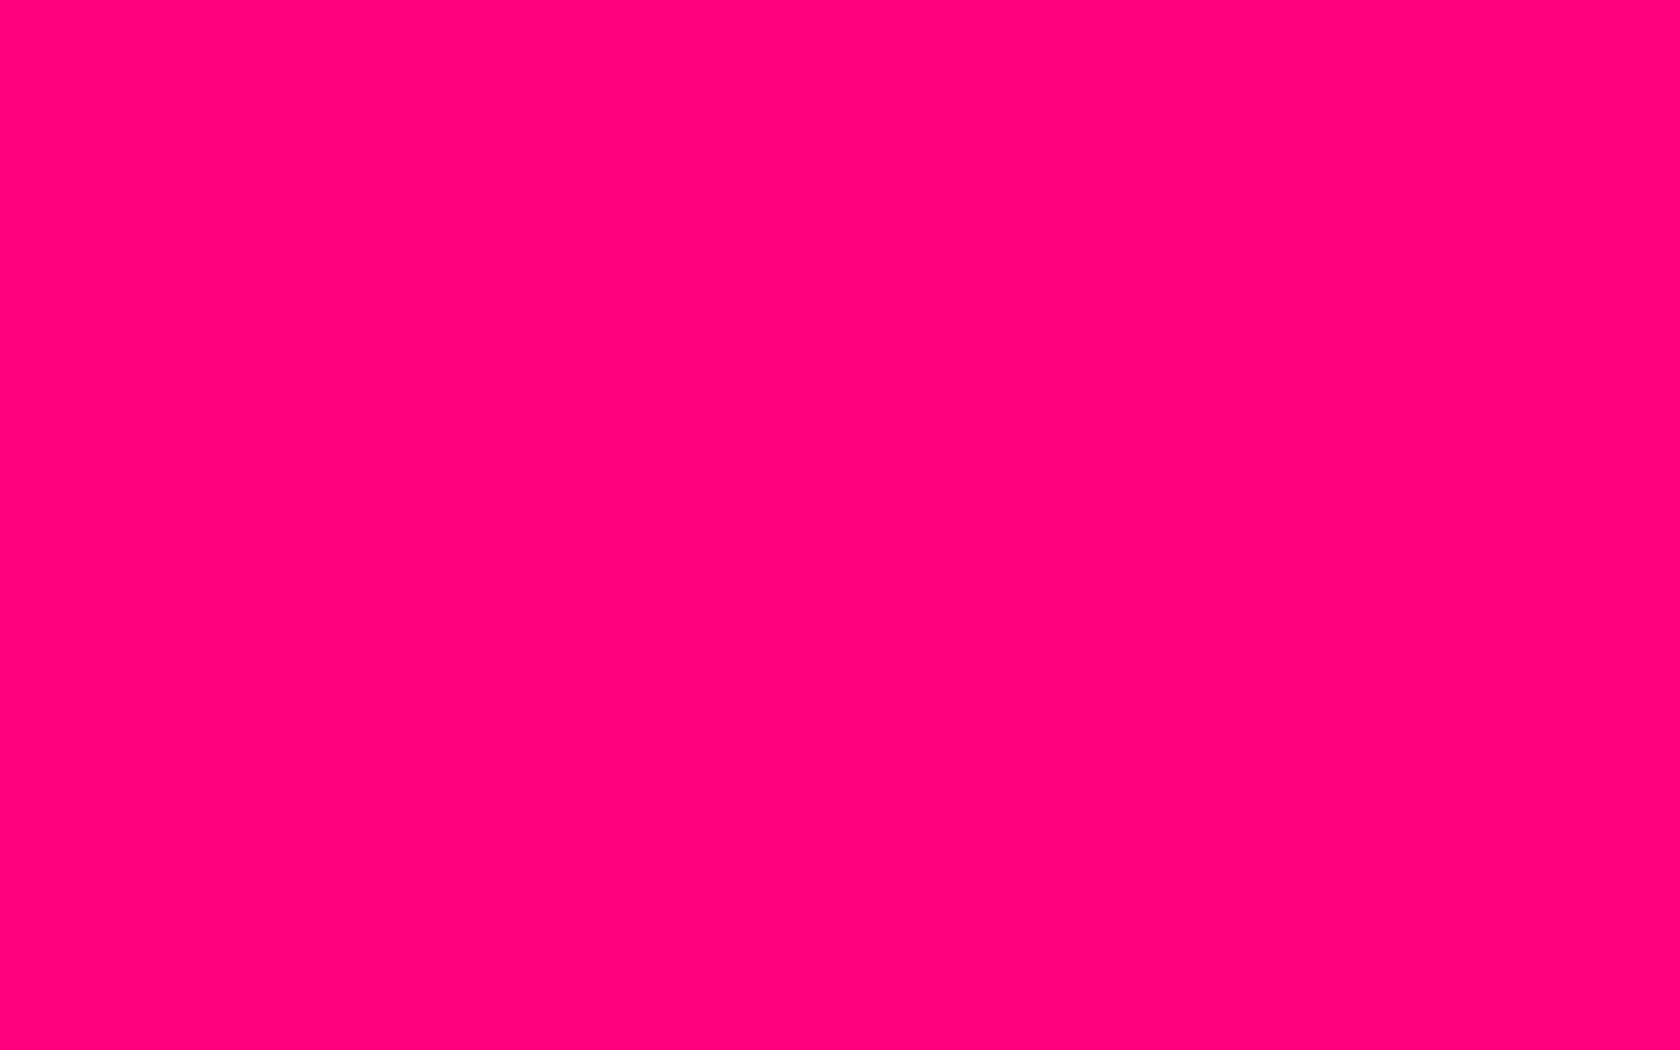 1680x1050 Rose Solid Color Background